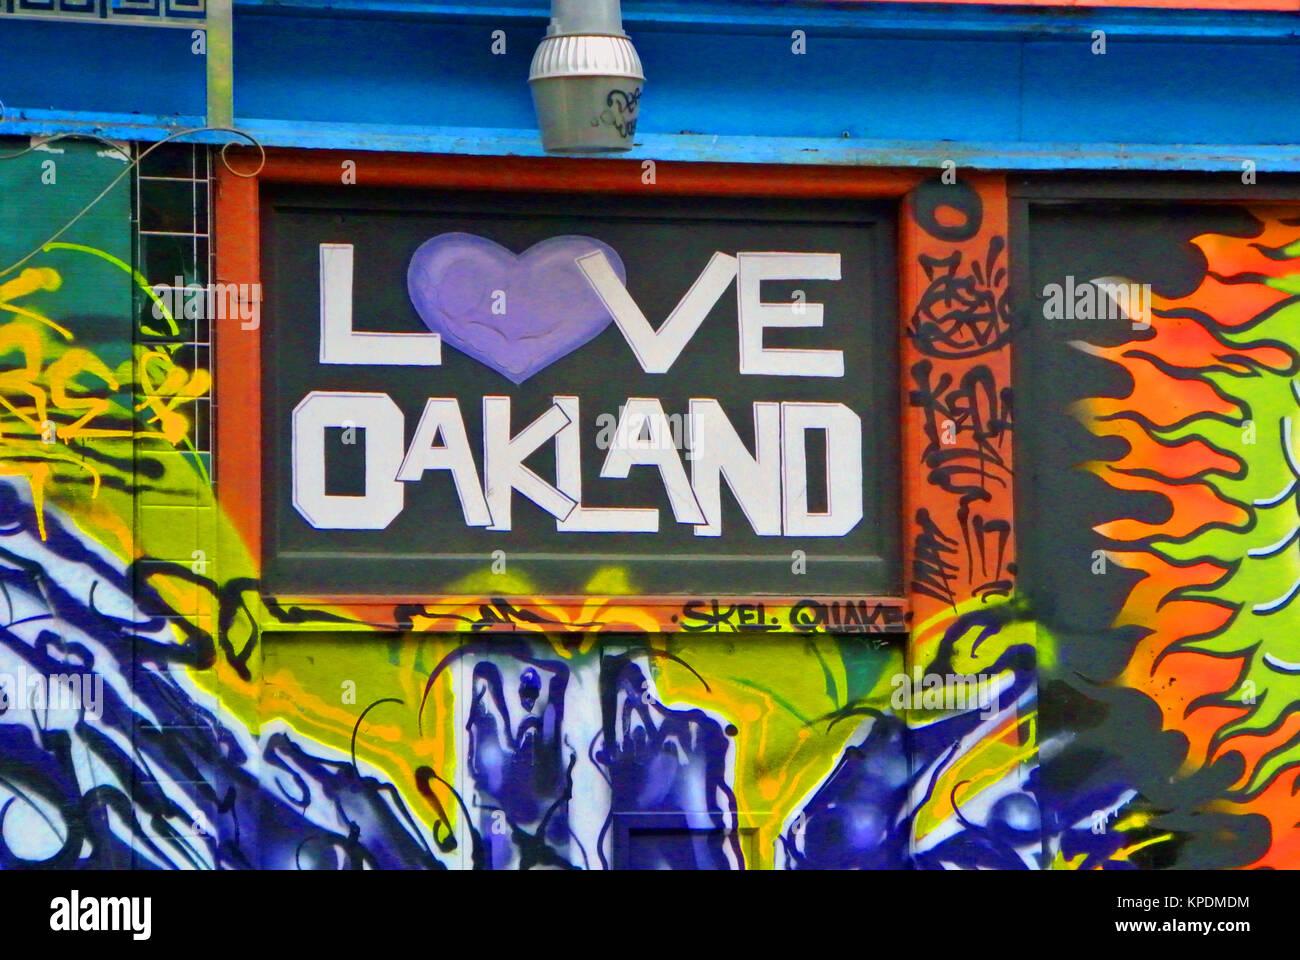 love oakland california sign Stock Photo